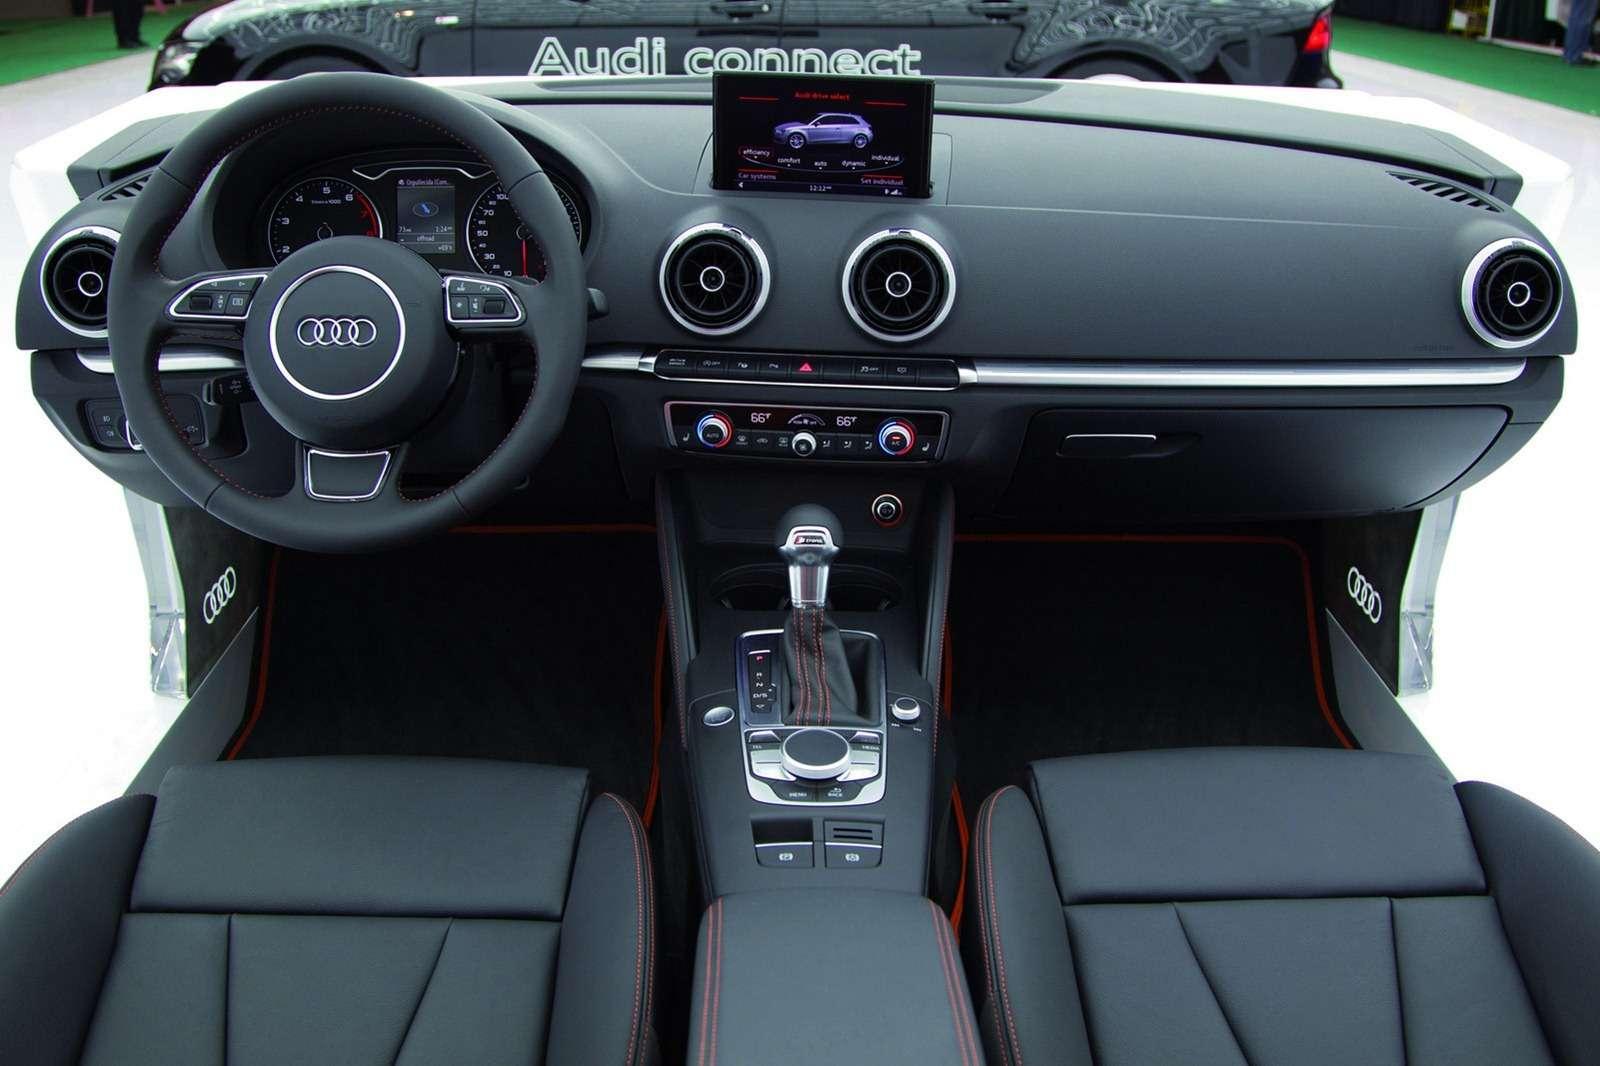 2013 Audi A3 first photo luty 2012